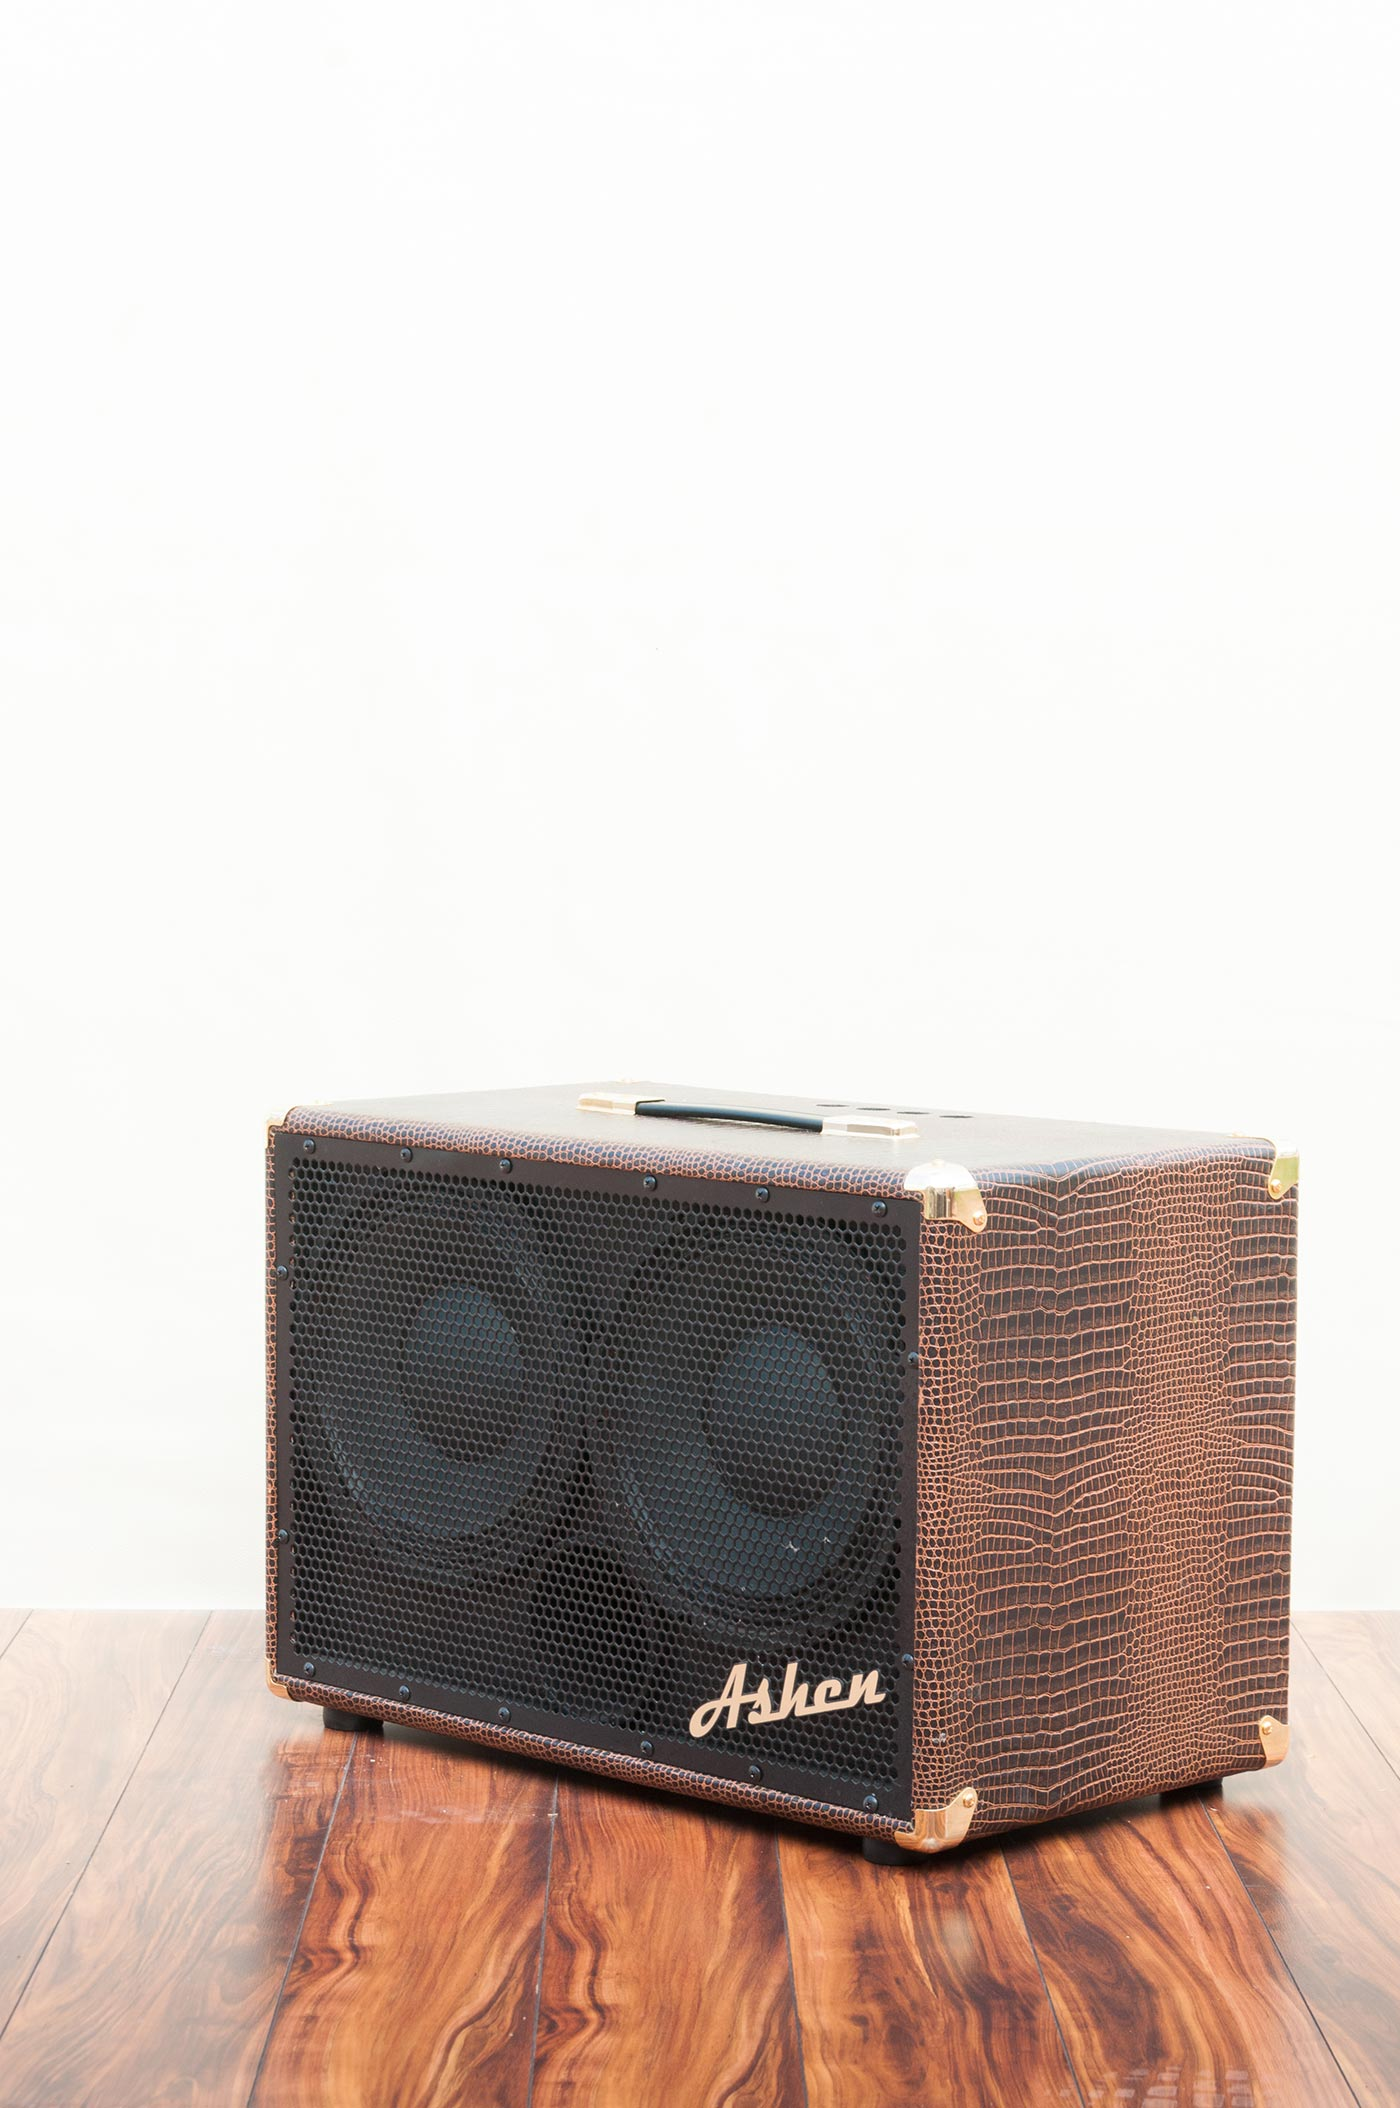 Ashen-Amps-Product-Shoot-14.jpg